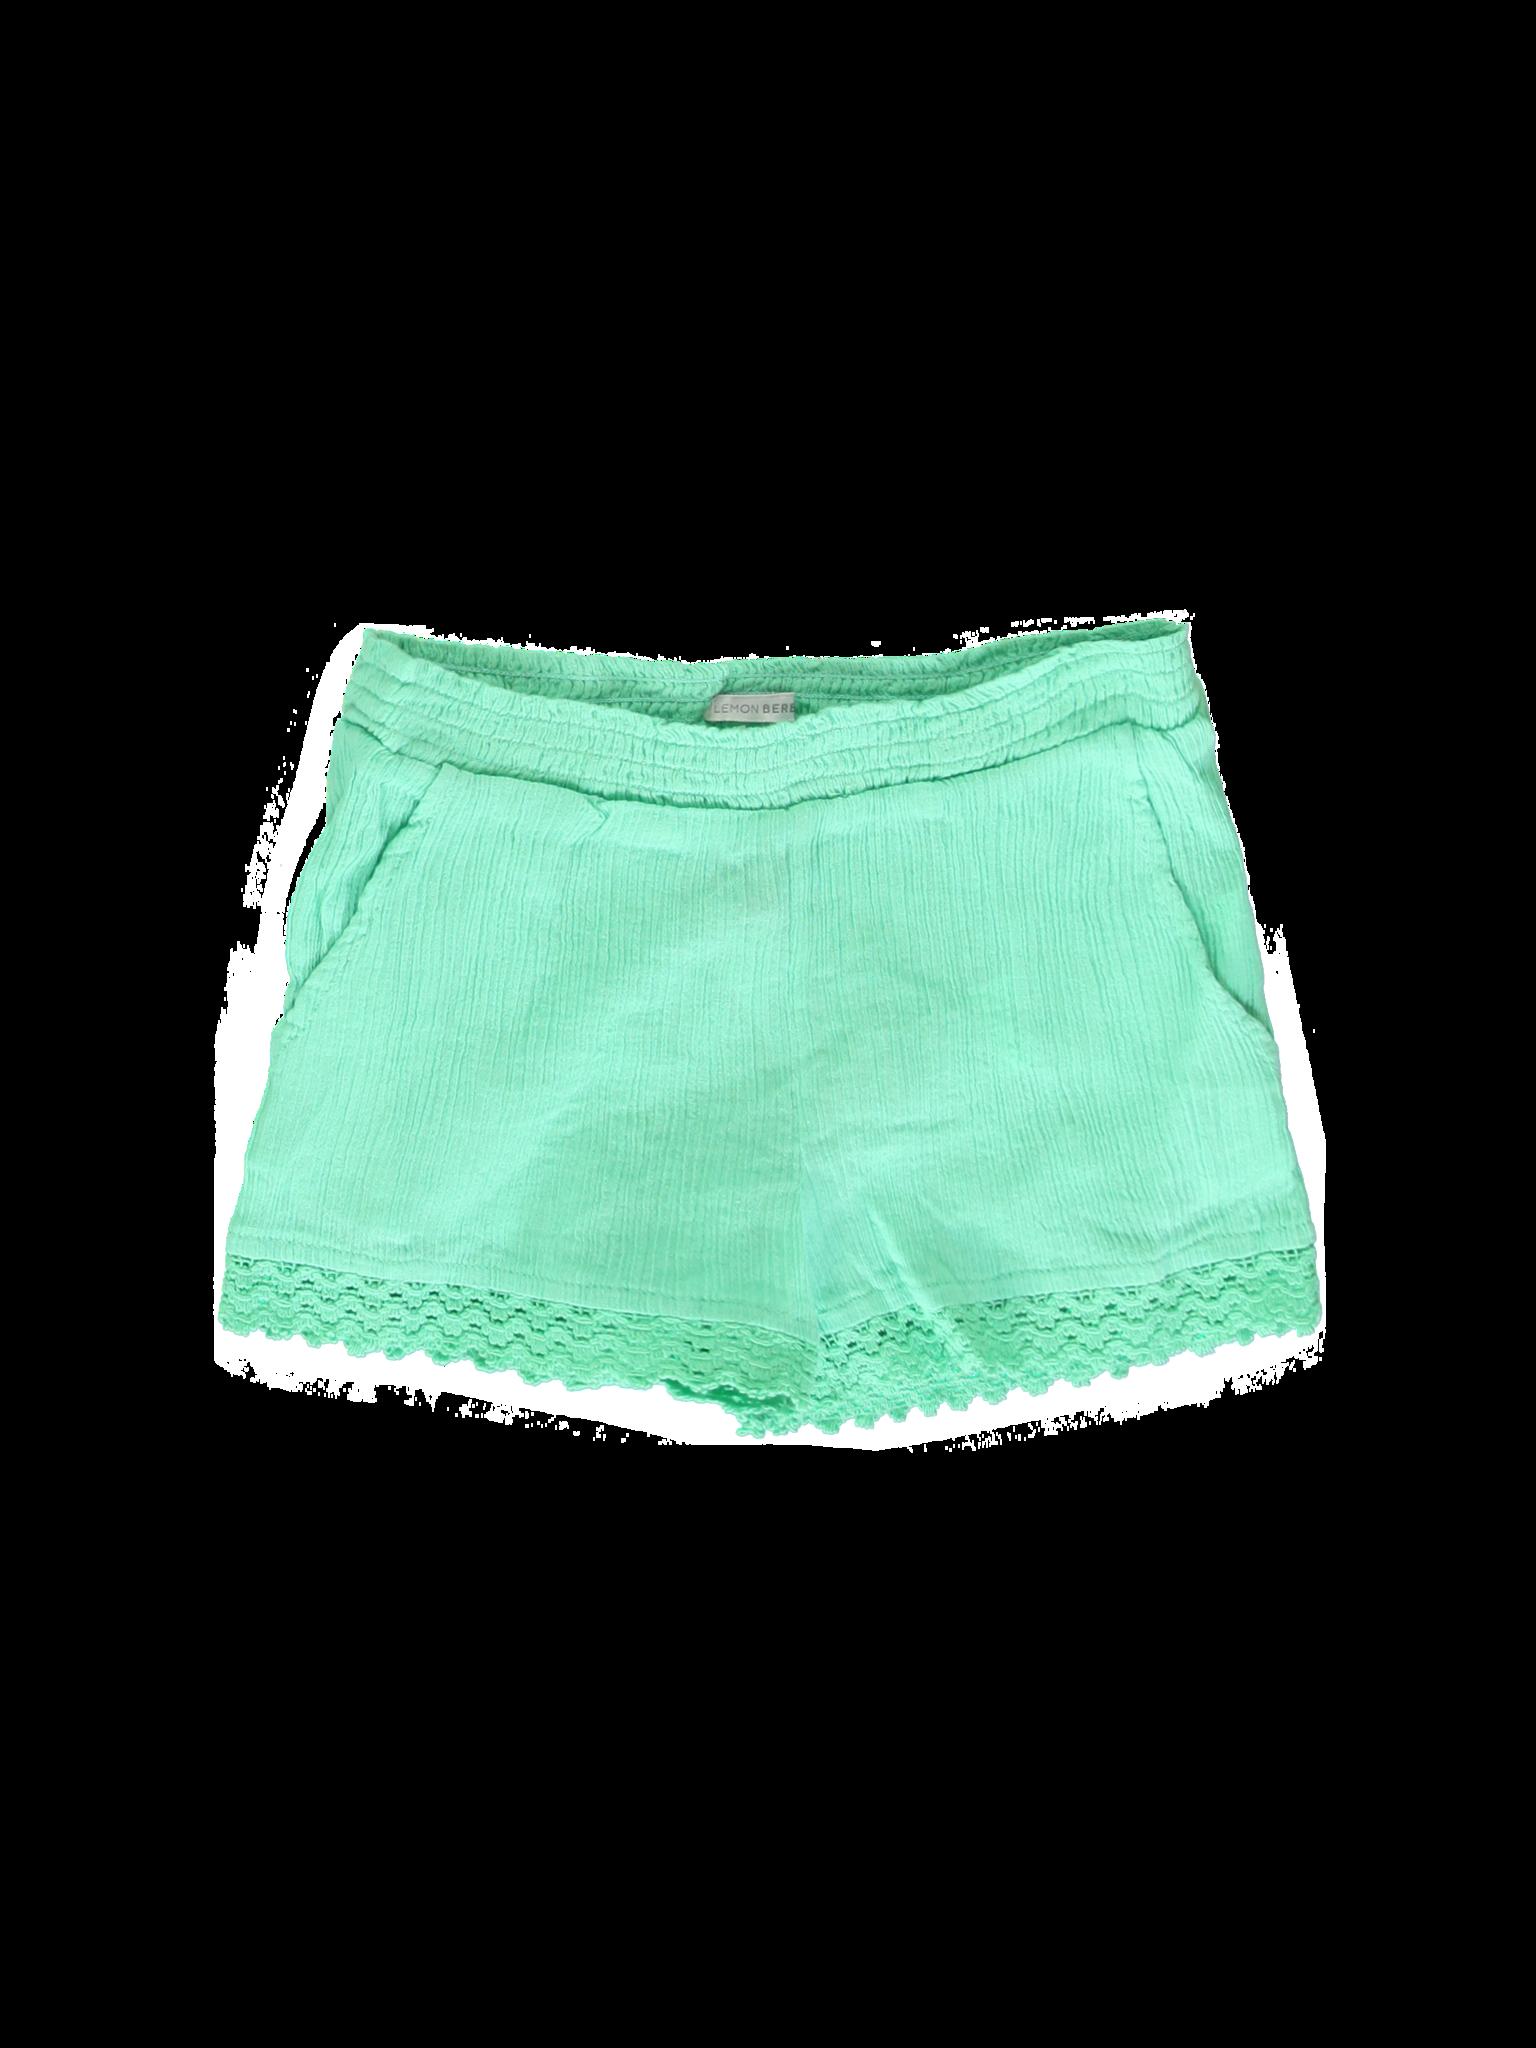 All Brands | Summerproducts Teen Girls | Shorts | 10 pcs/box